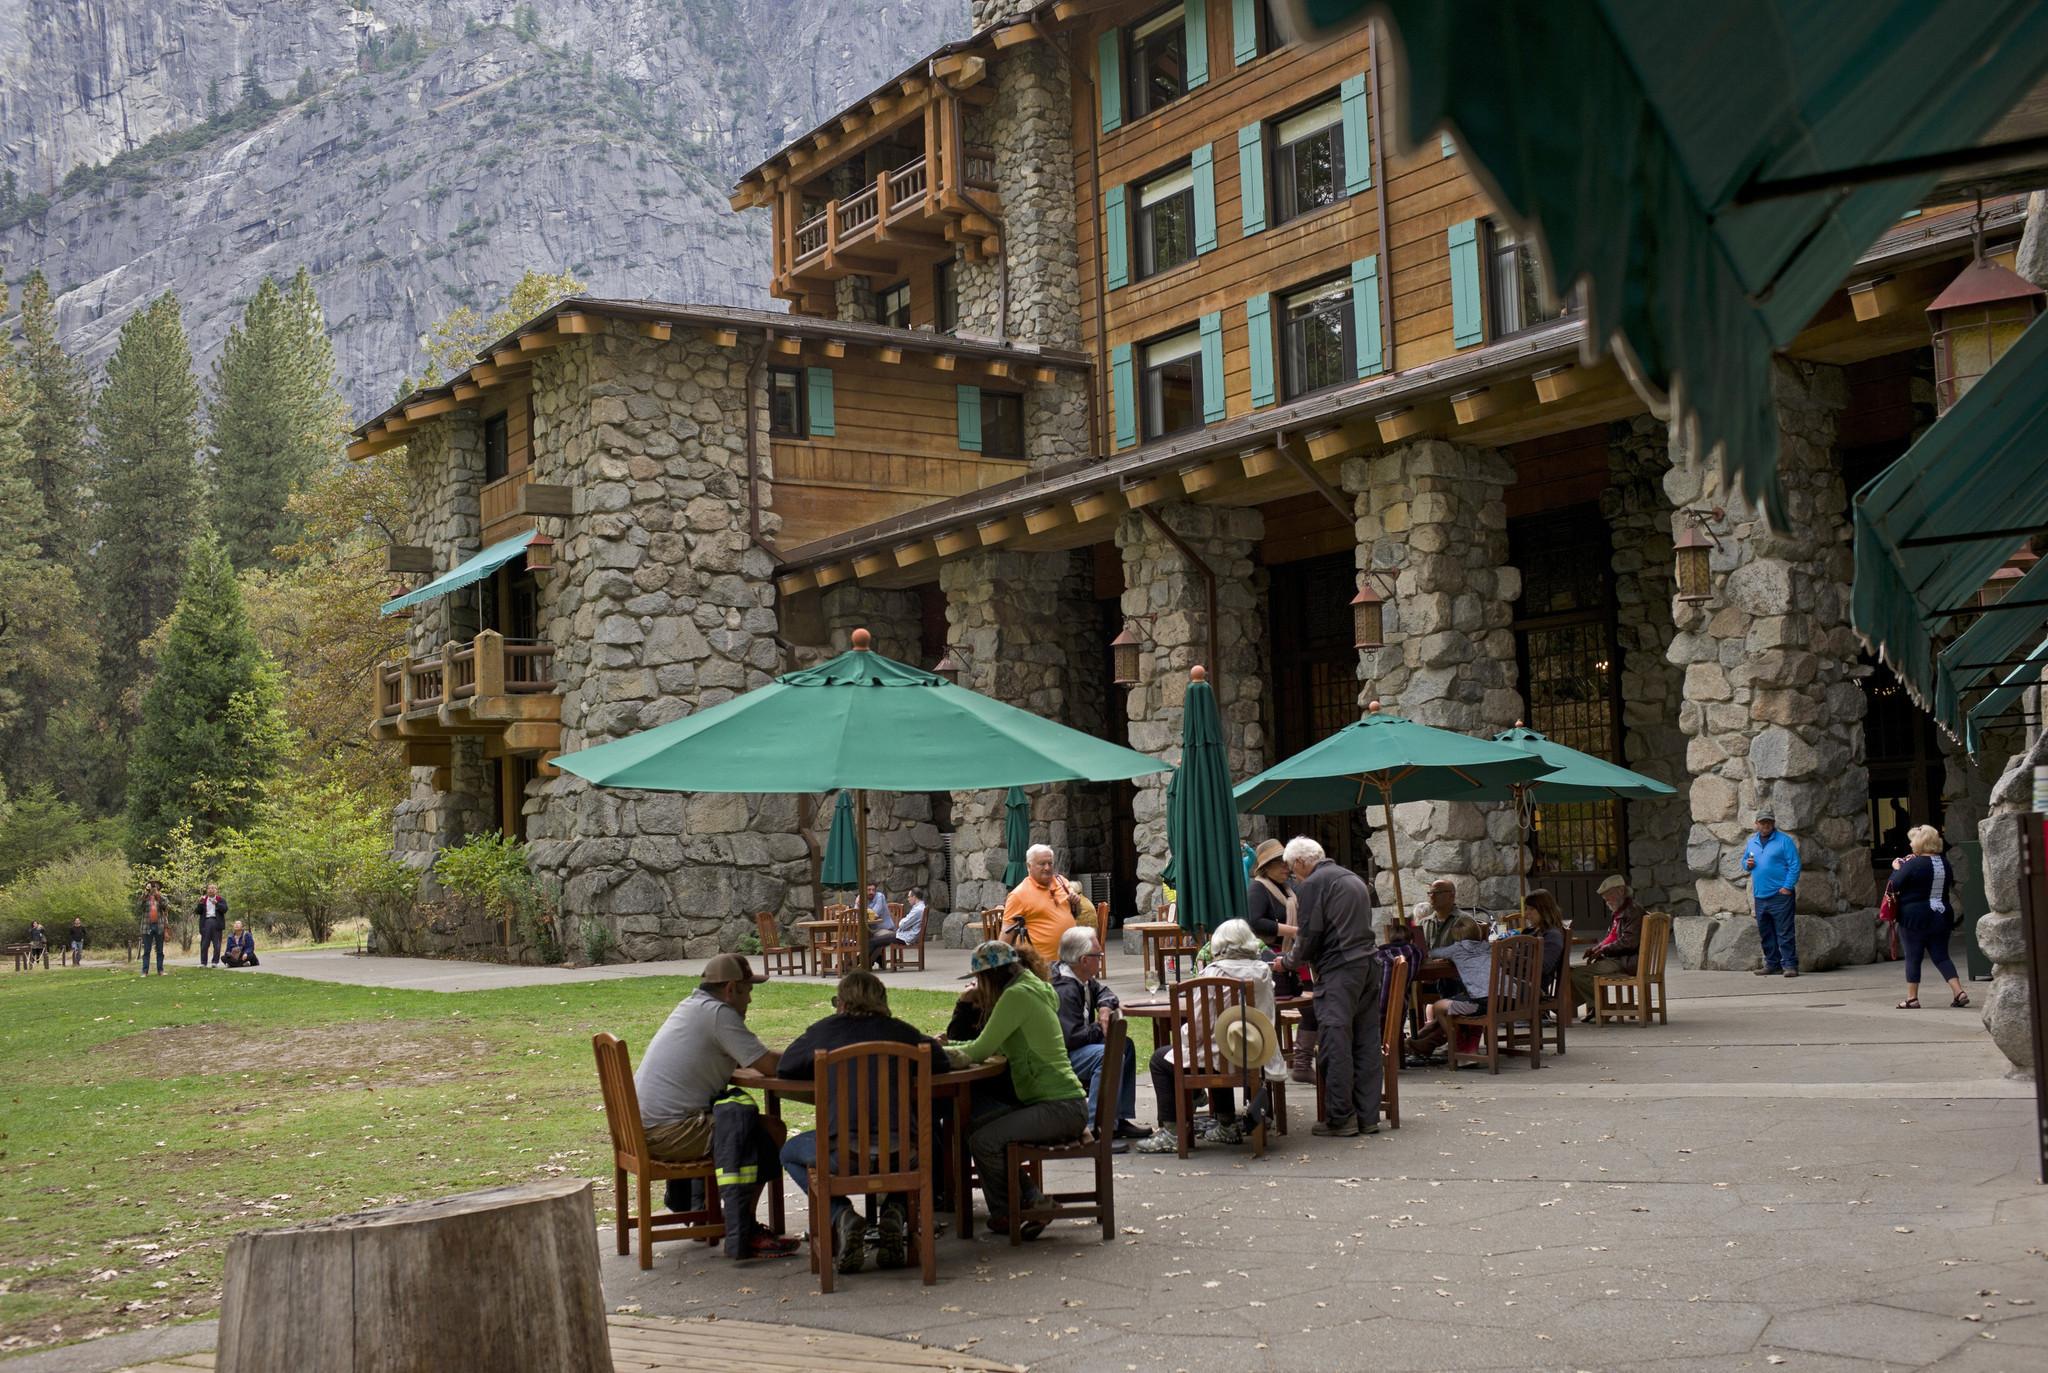 Yosemite S Famous Ahwahnee Hotel To Change Name In Trademark Dispute La Times